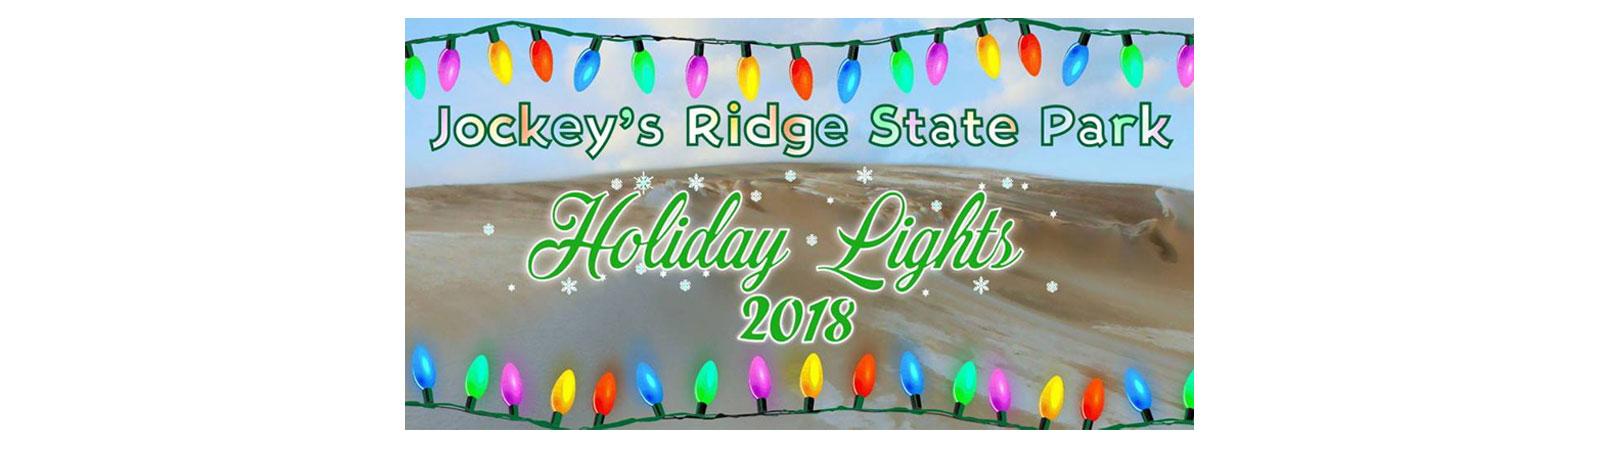 Jockeys Ridge State Park Holiday Lights